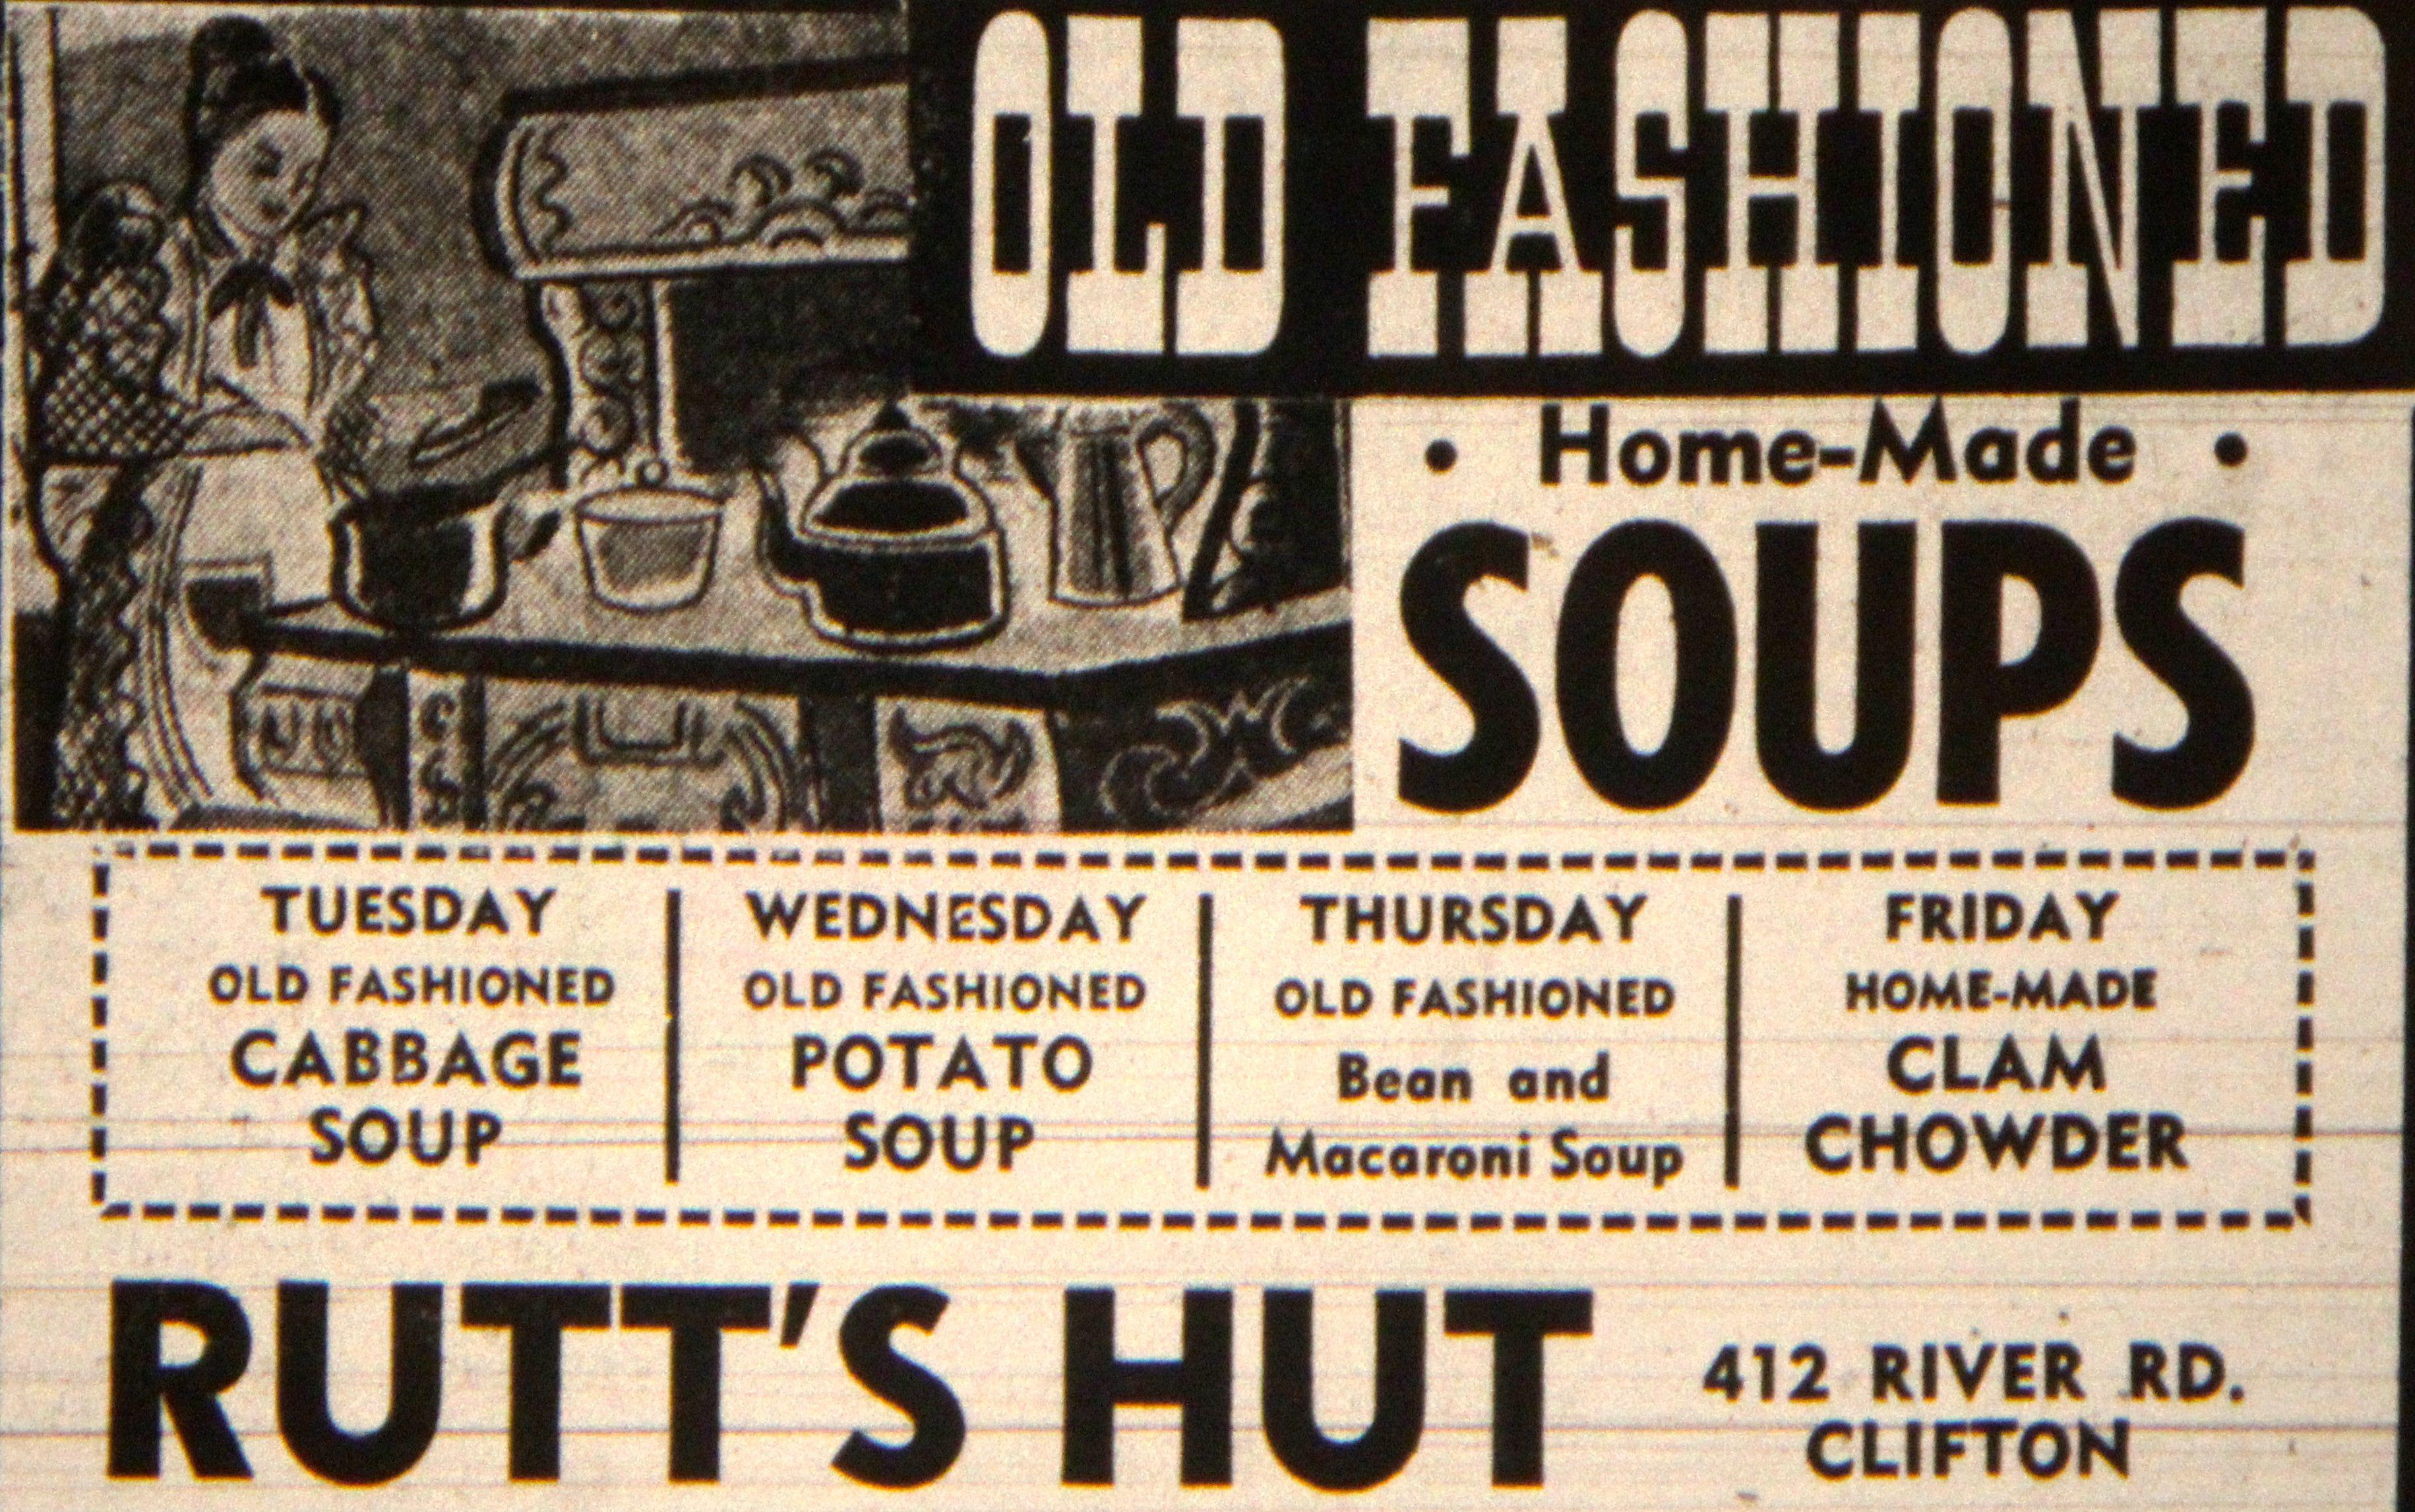 Rutt S Hut Ad Clifton Nj 1968 Clifton Paterson New Jersey